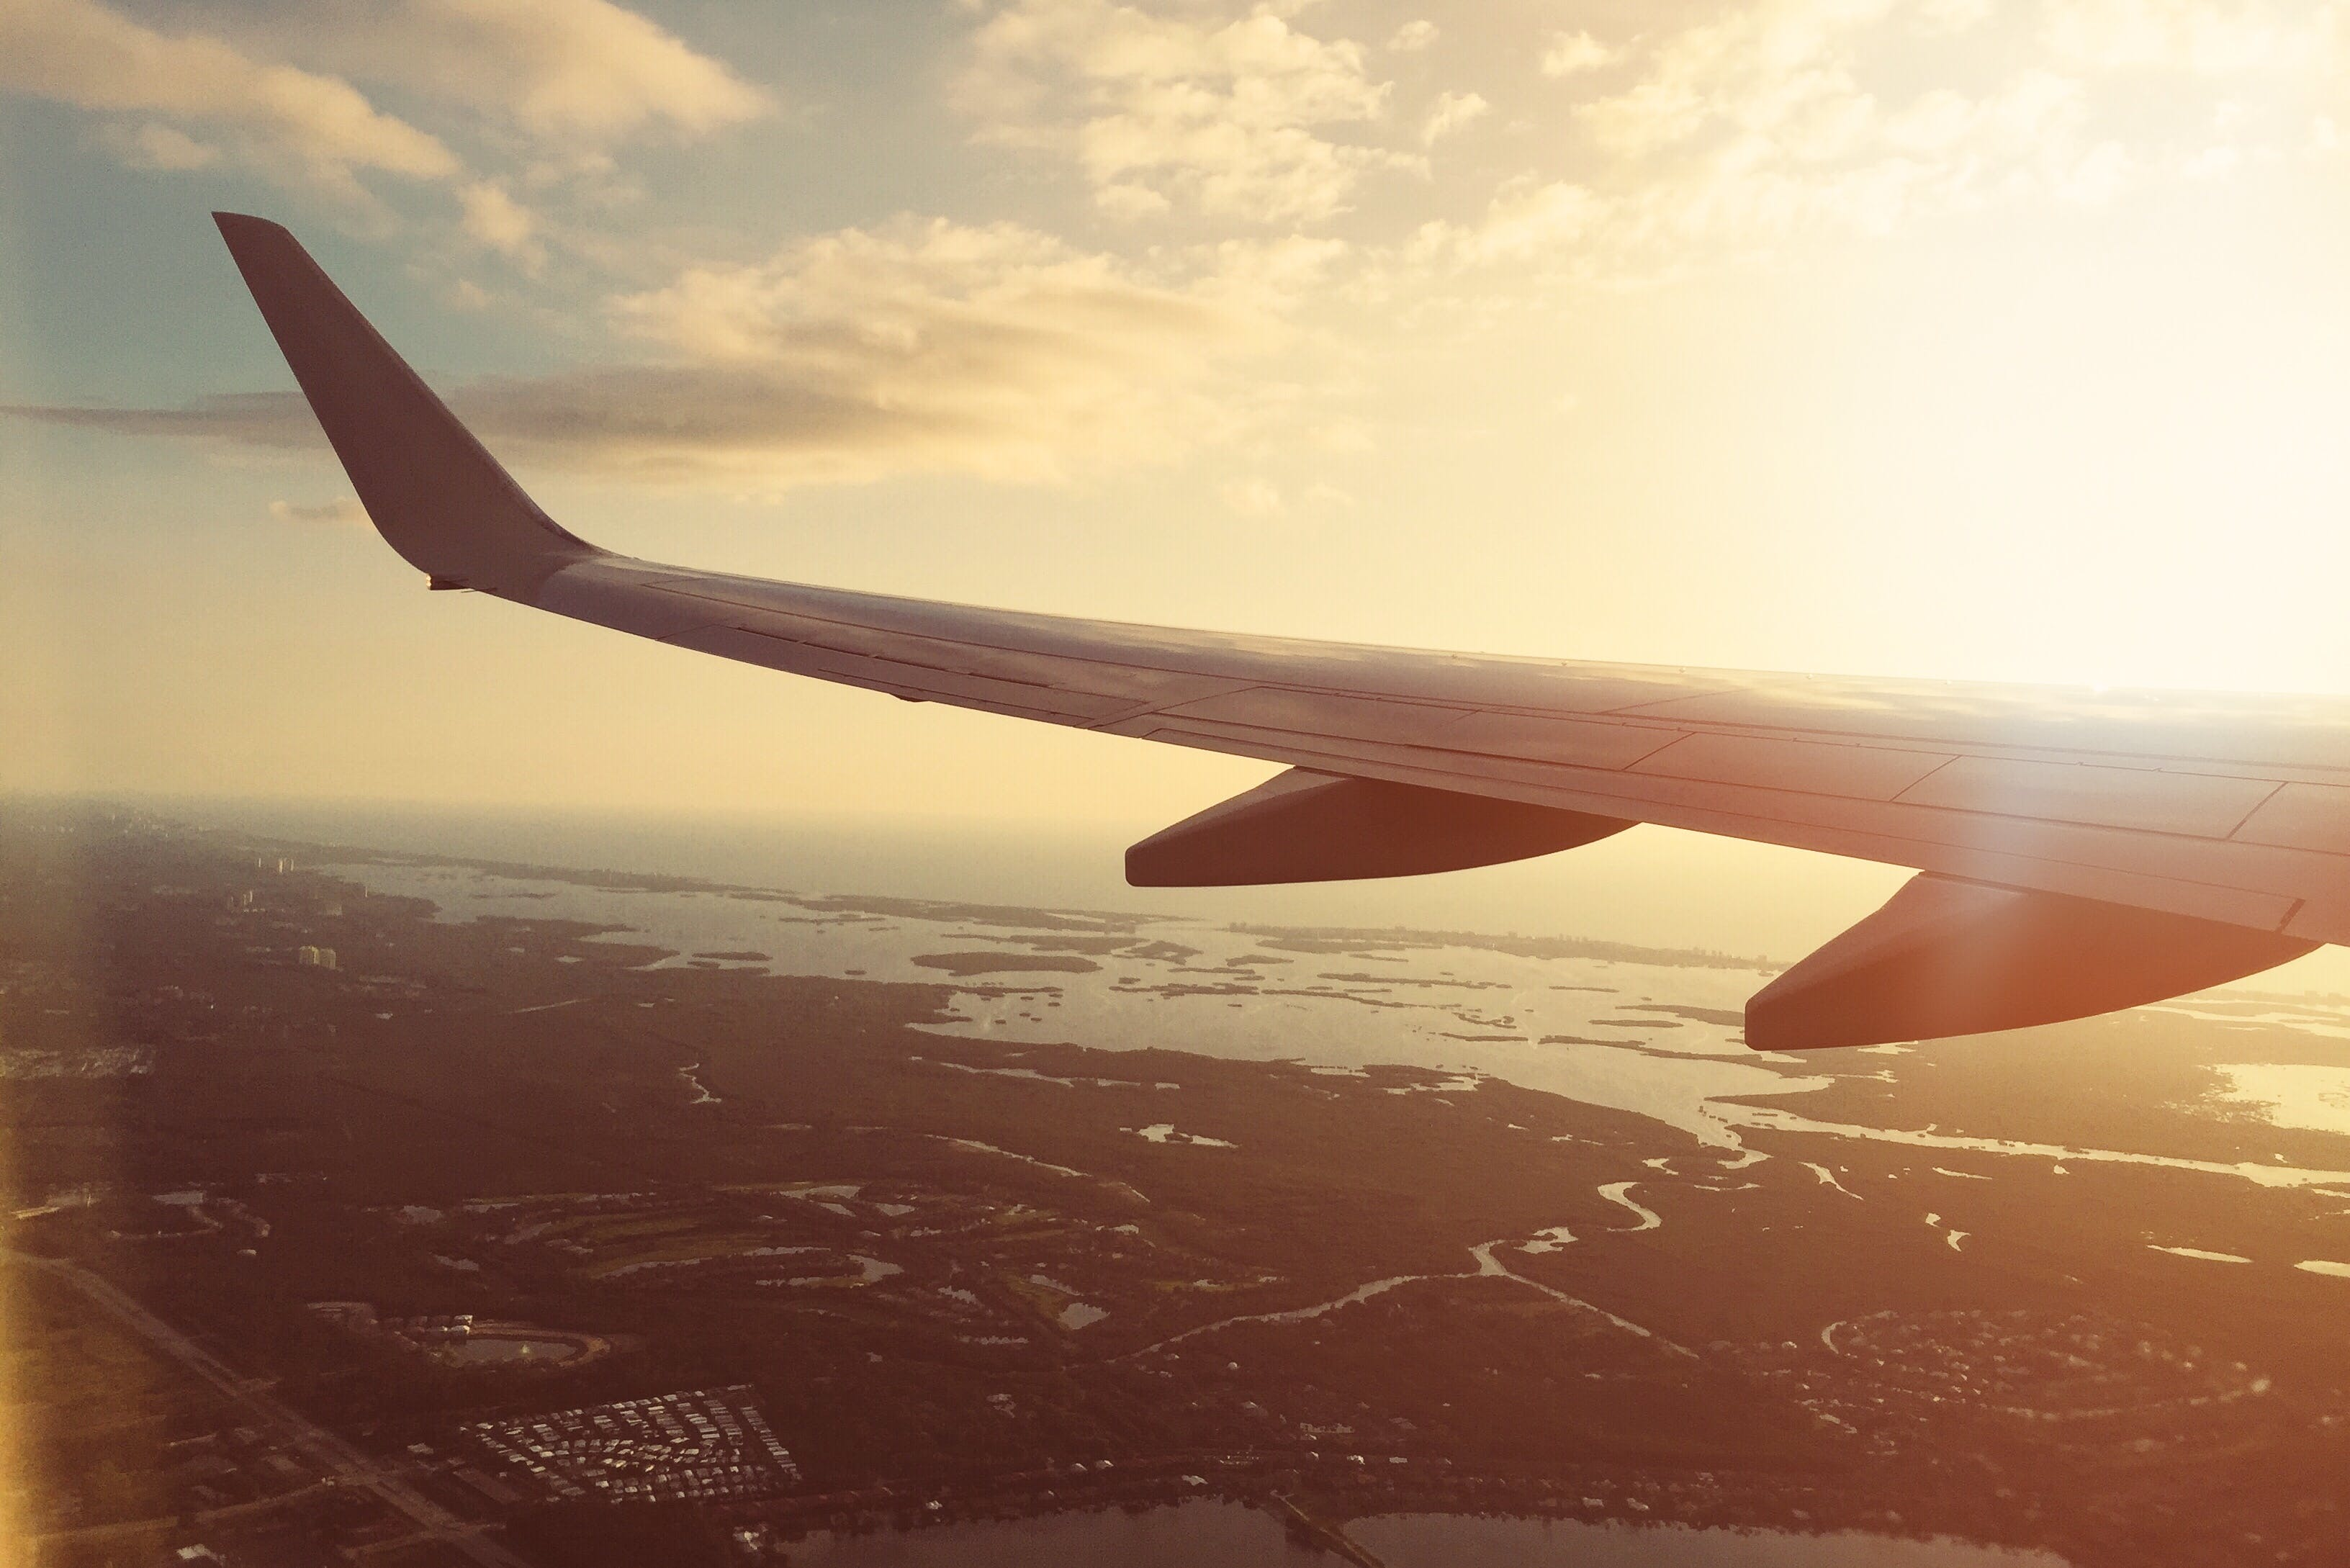 Gratis stockfoto met antenne, luchtfoto, passagiersvliegtuig, transport